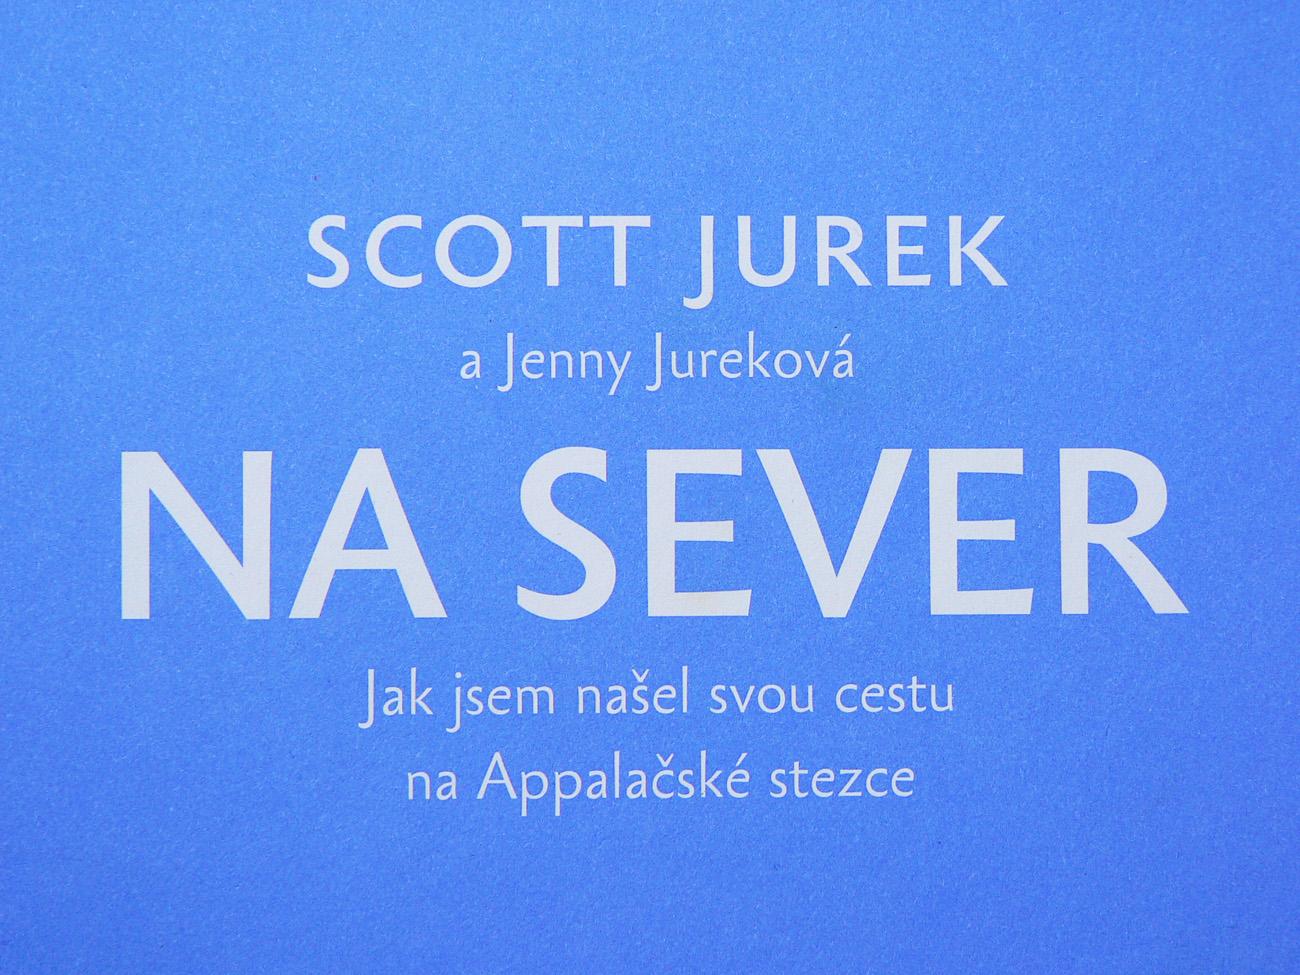 scott-jurek-a-jenny-jurekova-na-sever